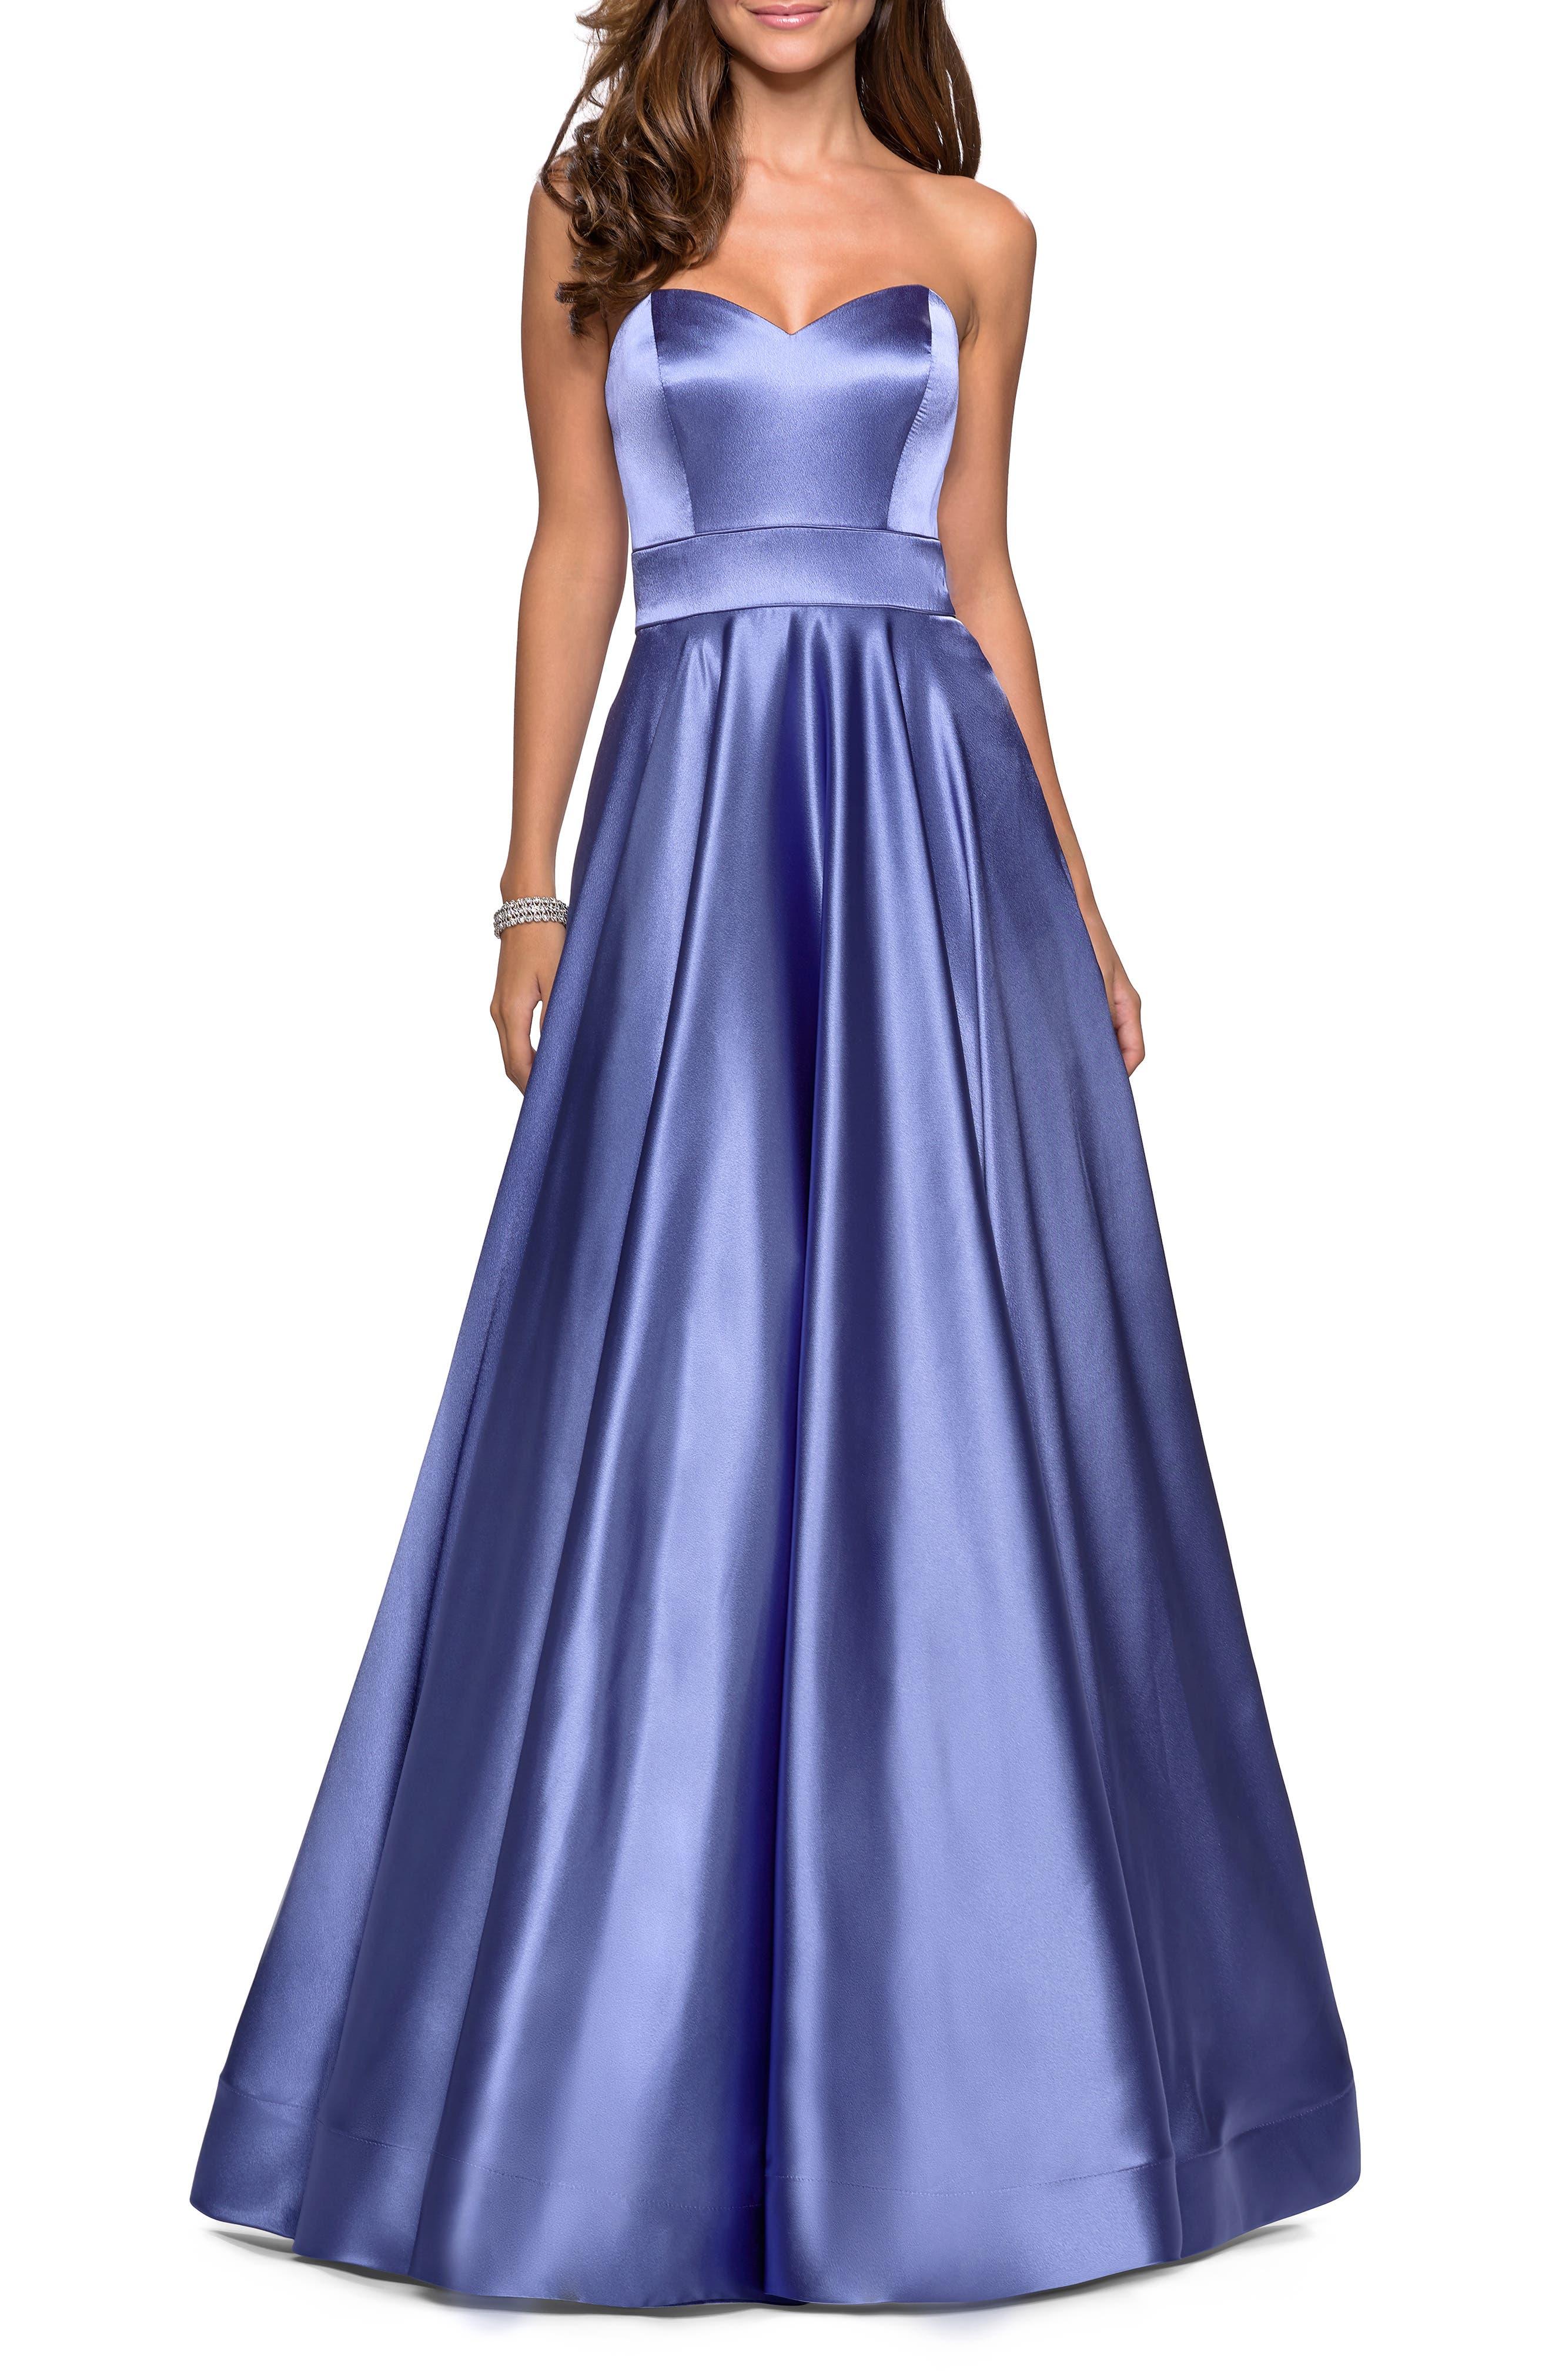 La Femme Strapless Satin Evening Dress, Blue